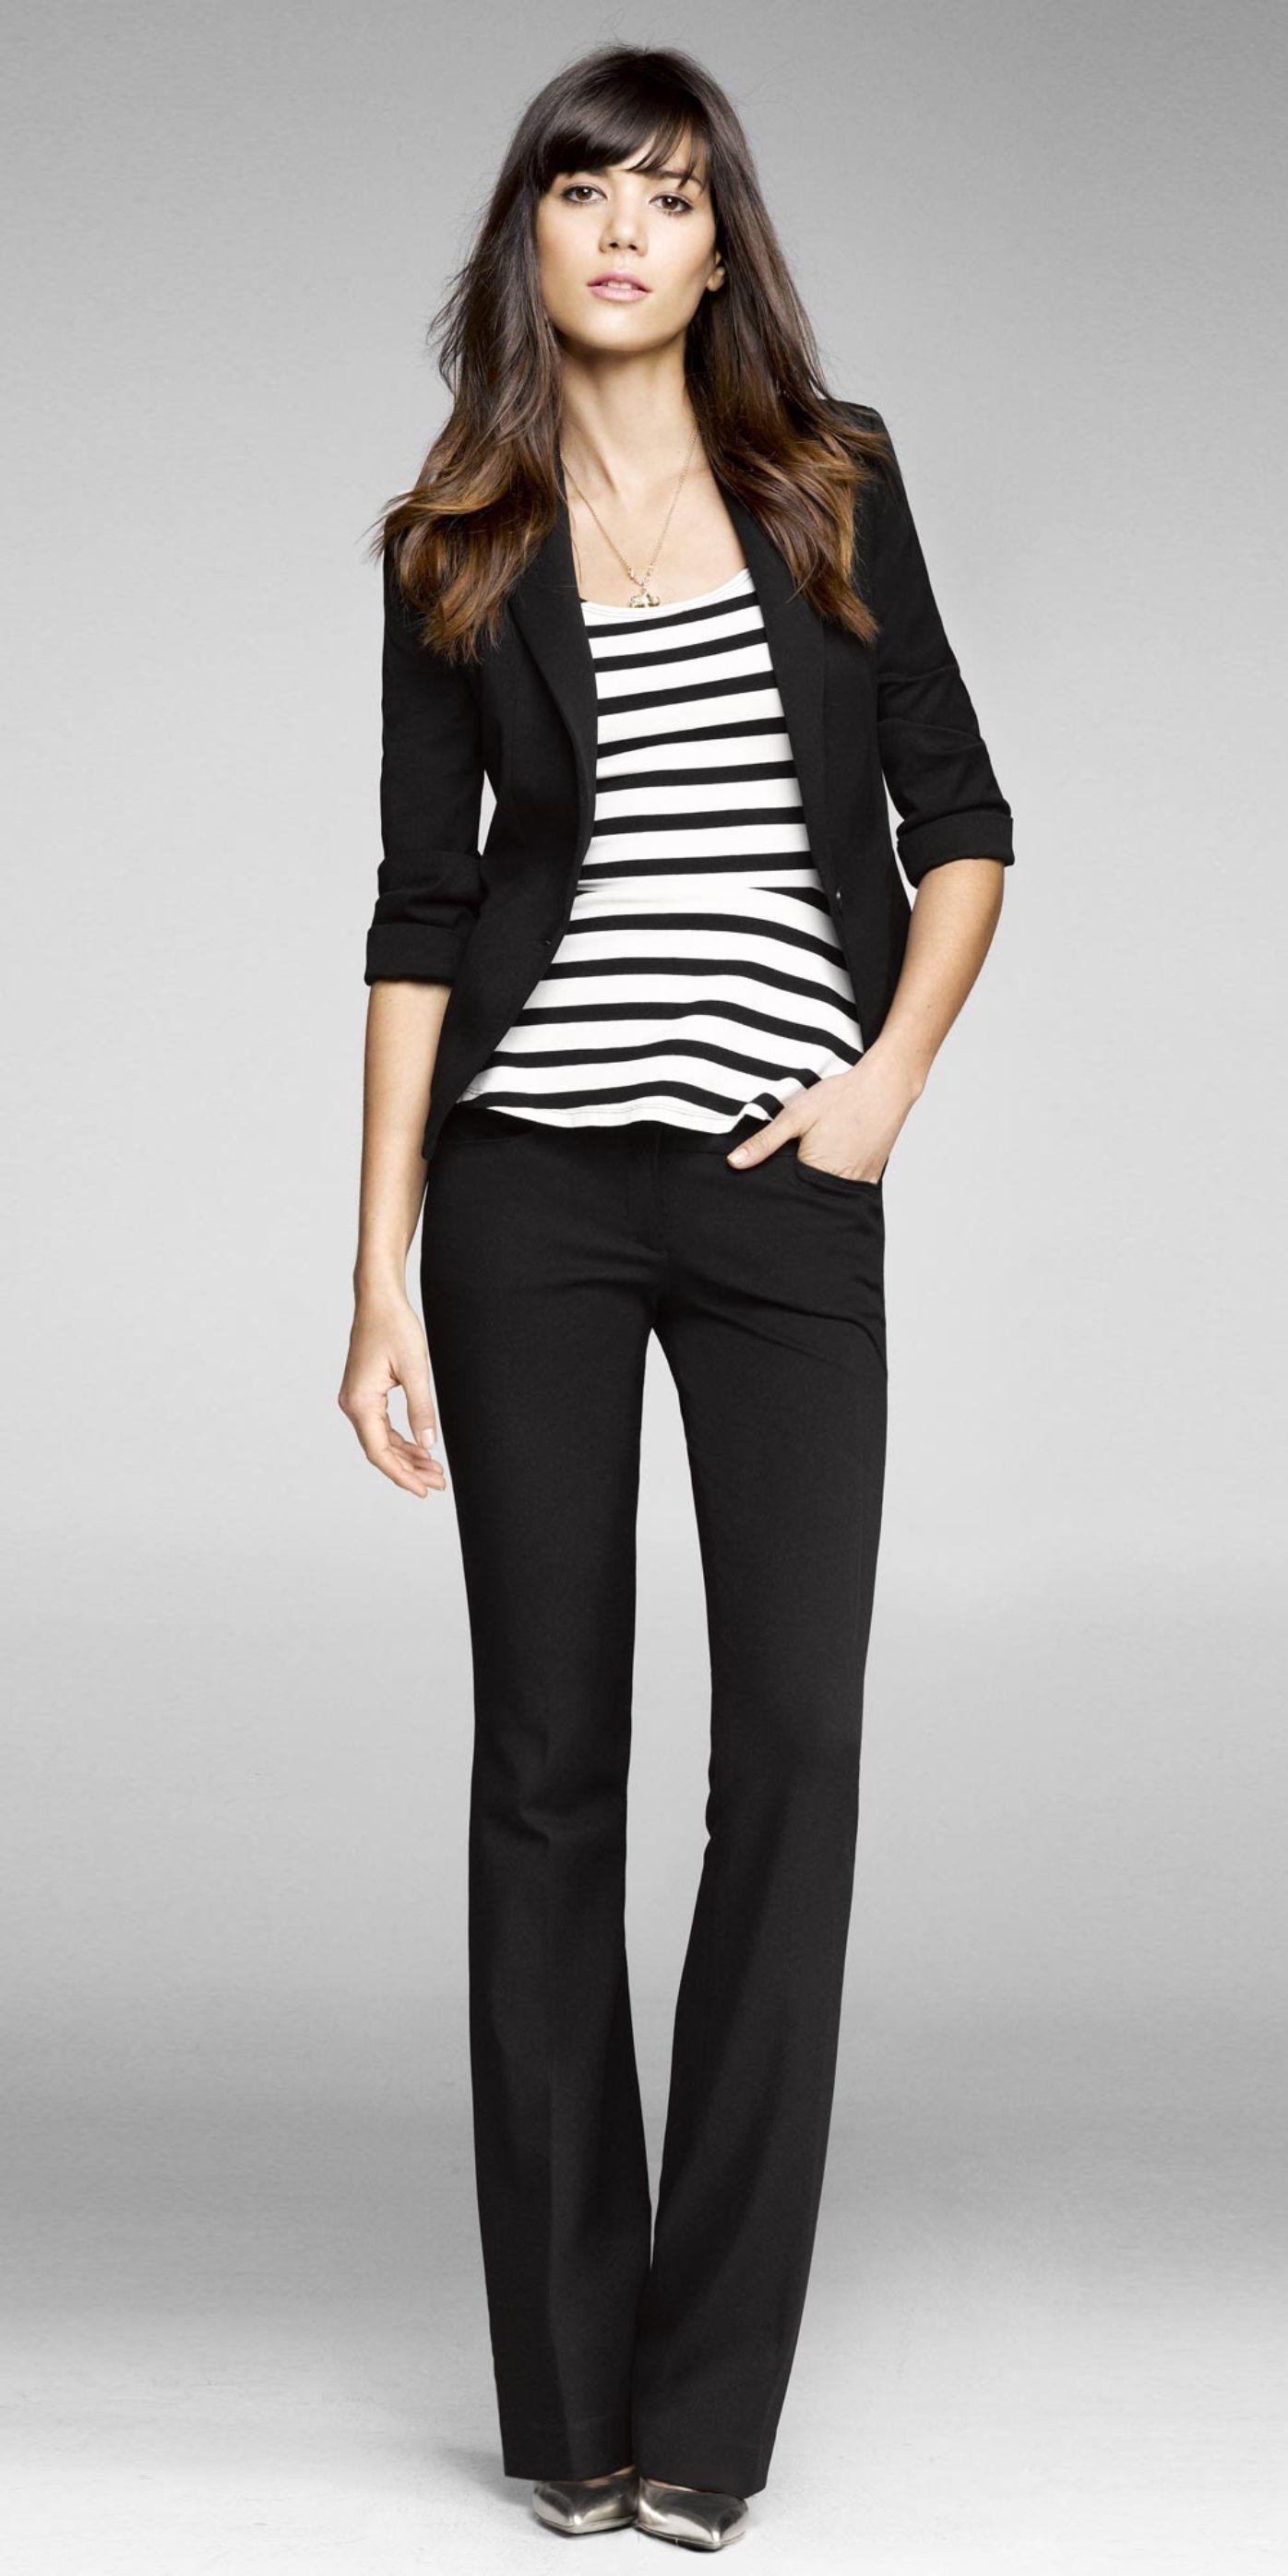 Black slacks, black blazer and striped top